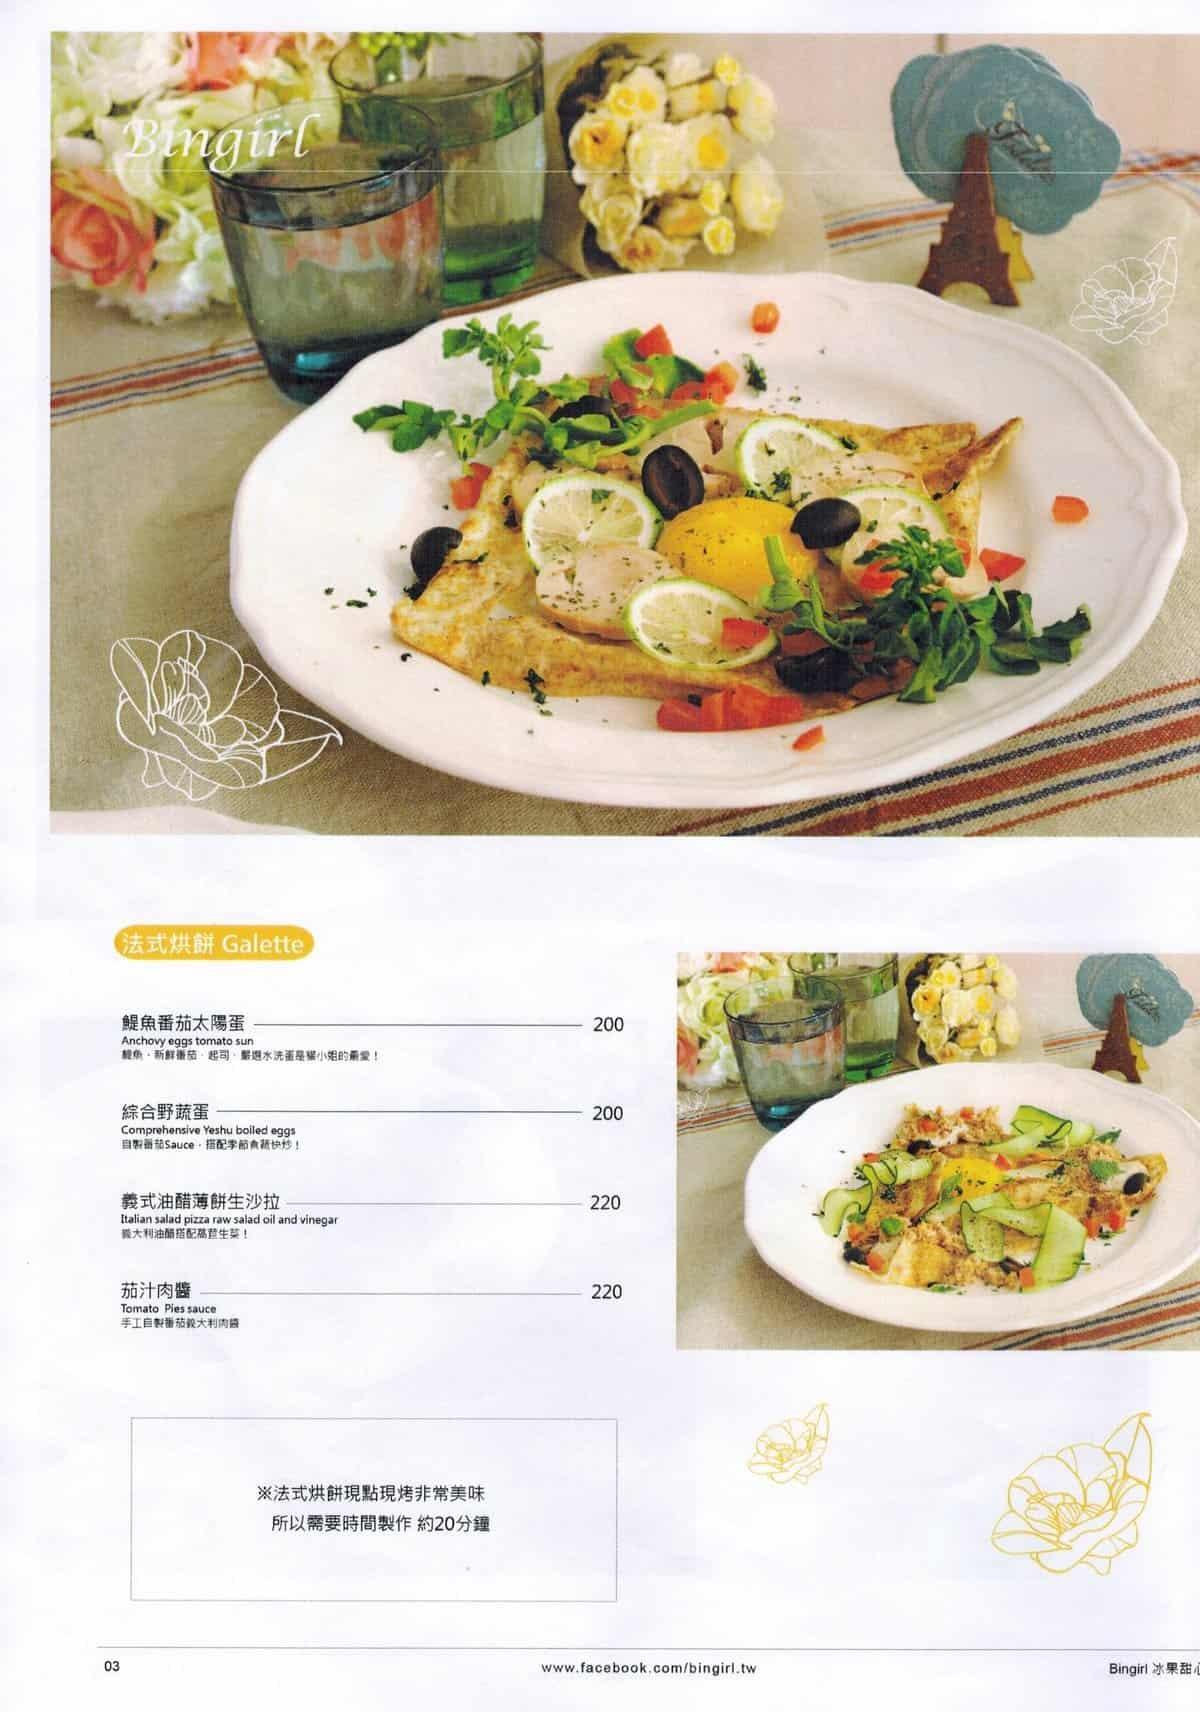 taipei-bingirl-menu4